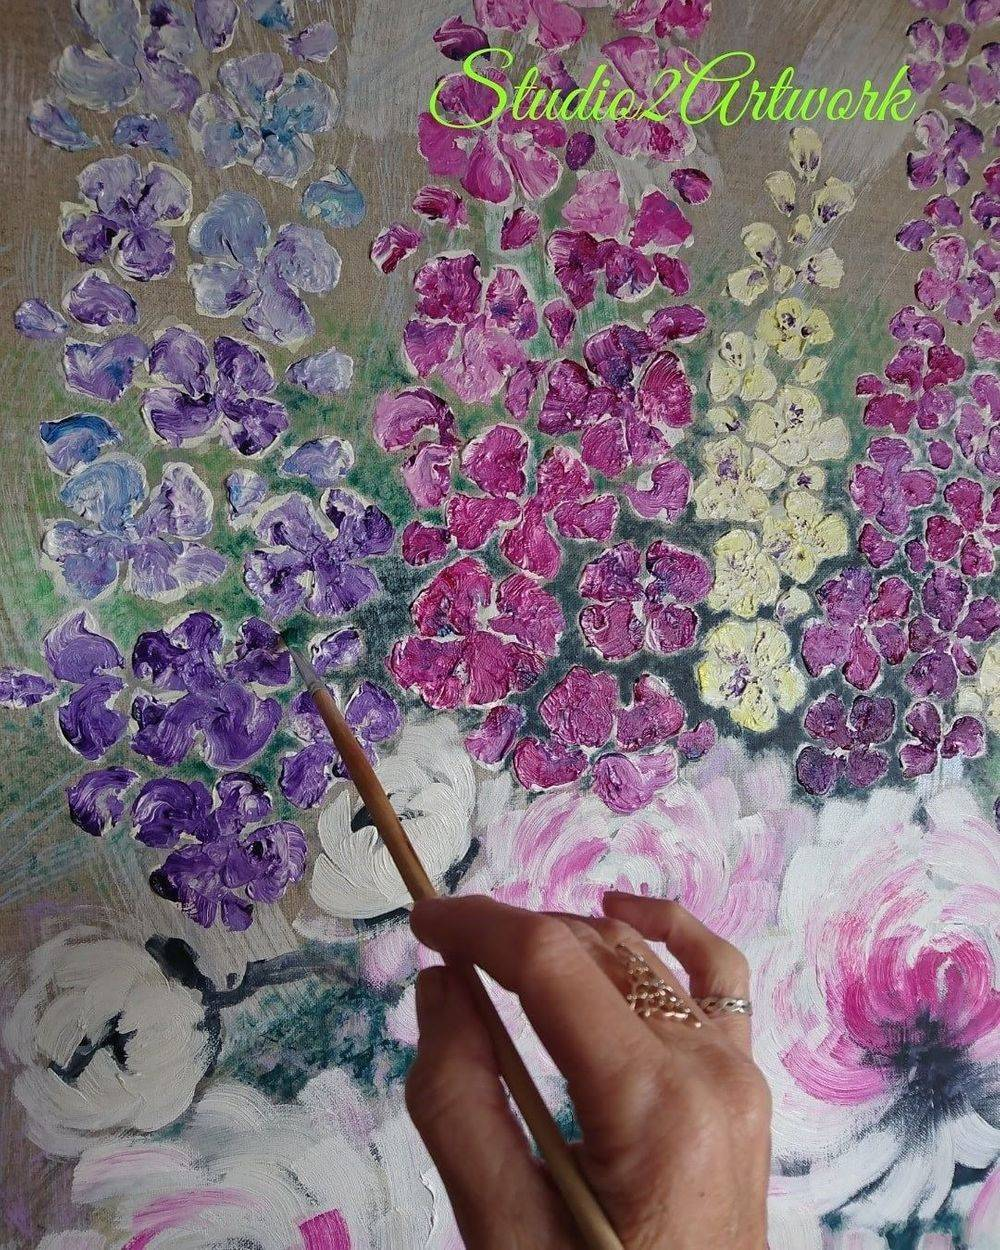 Artwork for Sale. Oil Painting. Original Artwork. Studio2Artwork. Artist. Art.